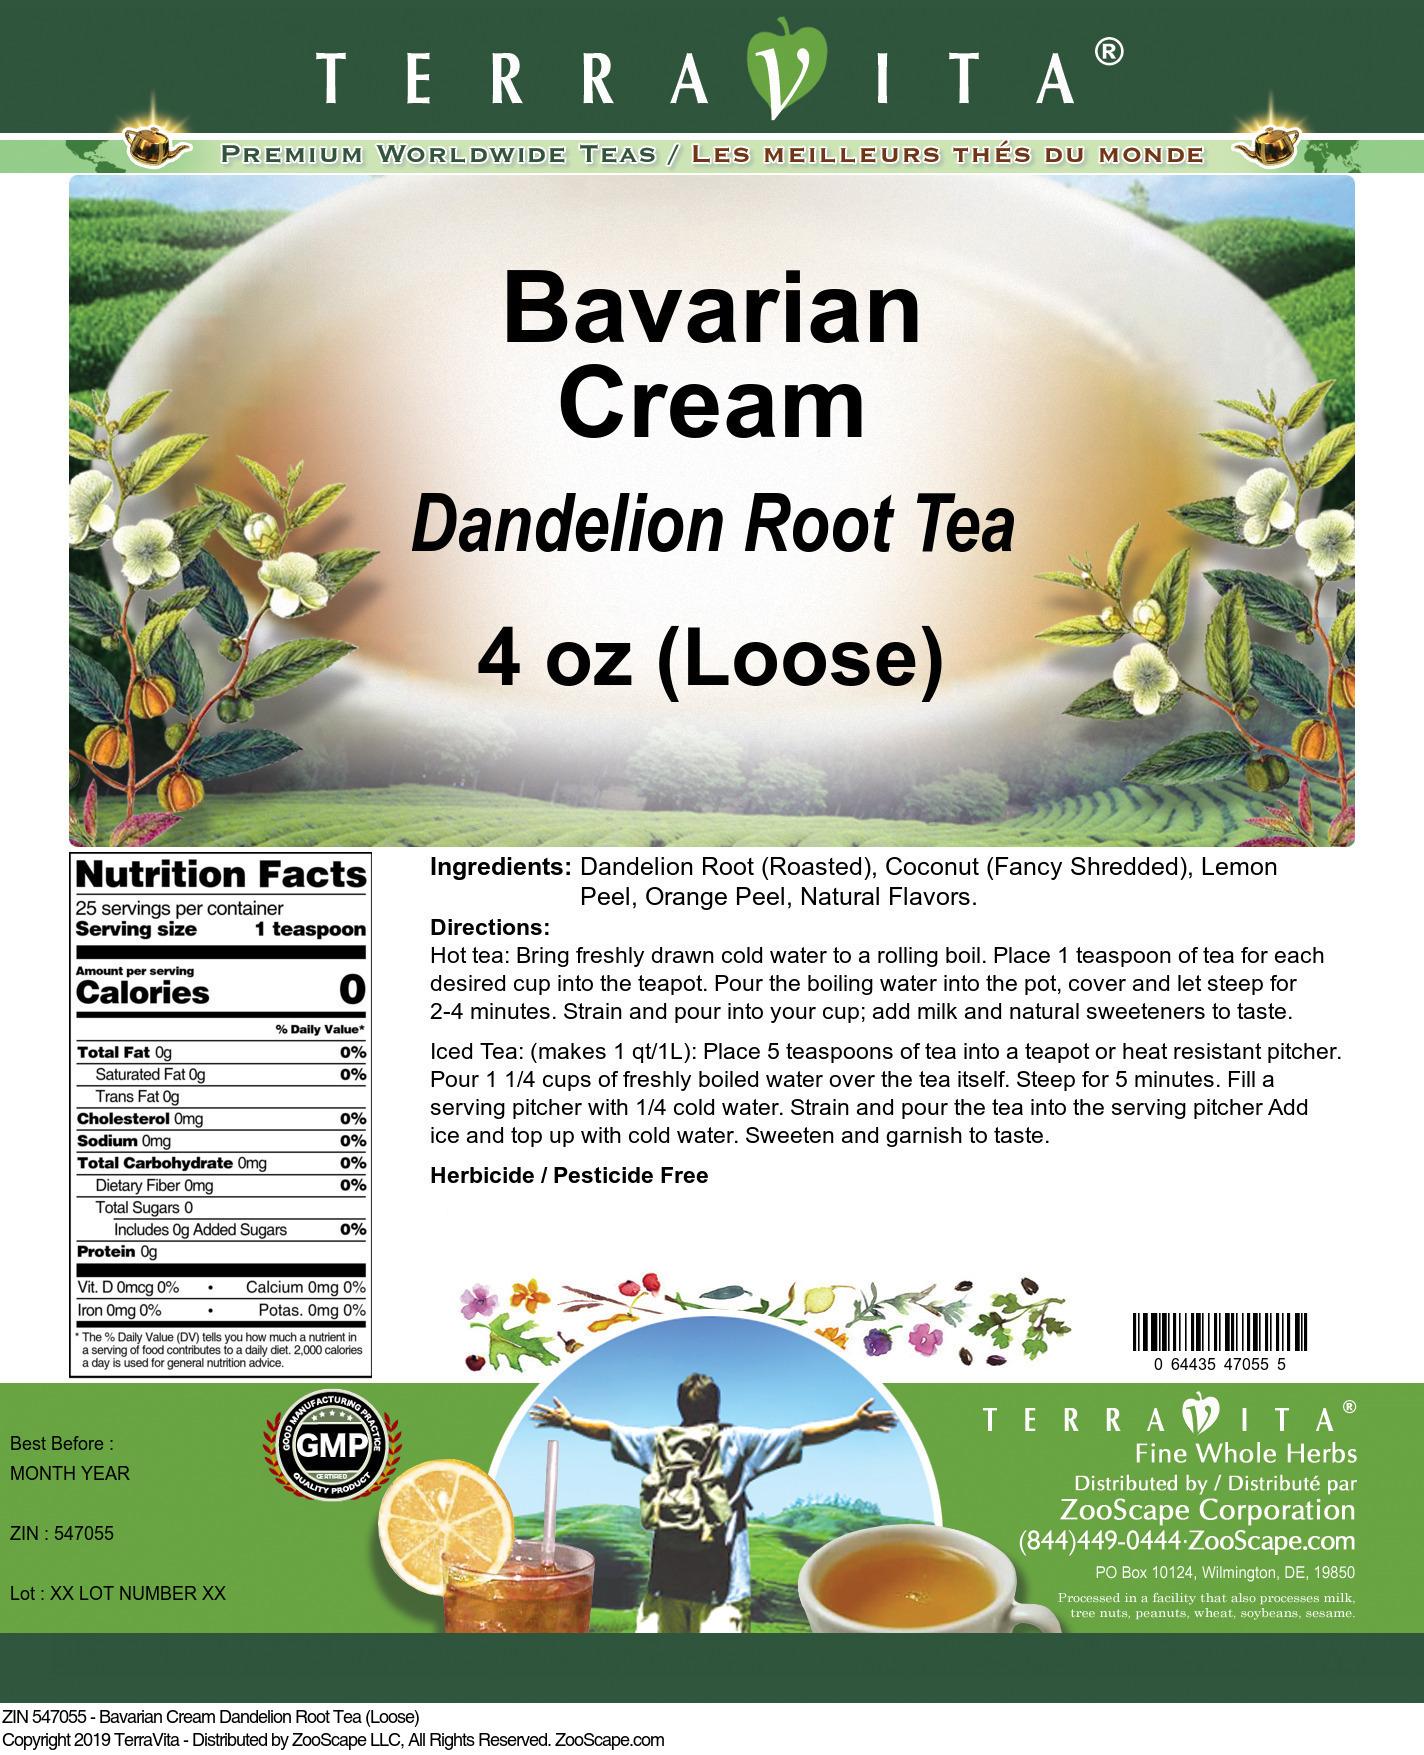 Bavarian Cream Dandelion Root